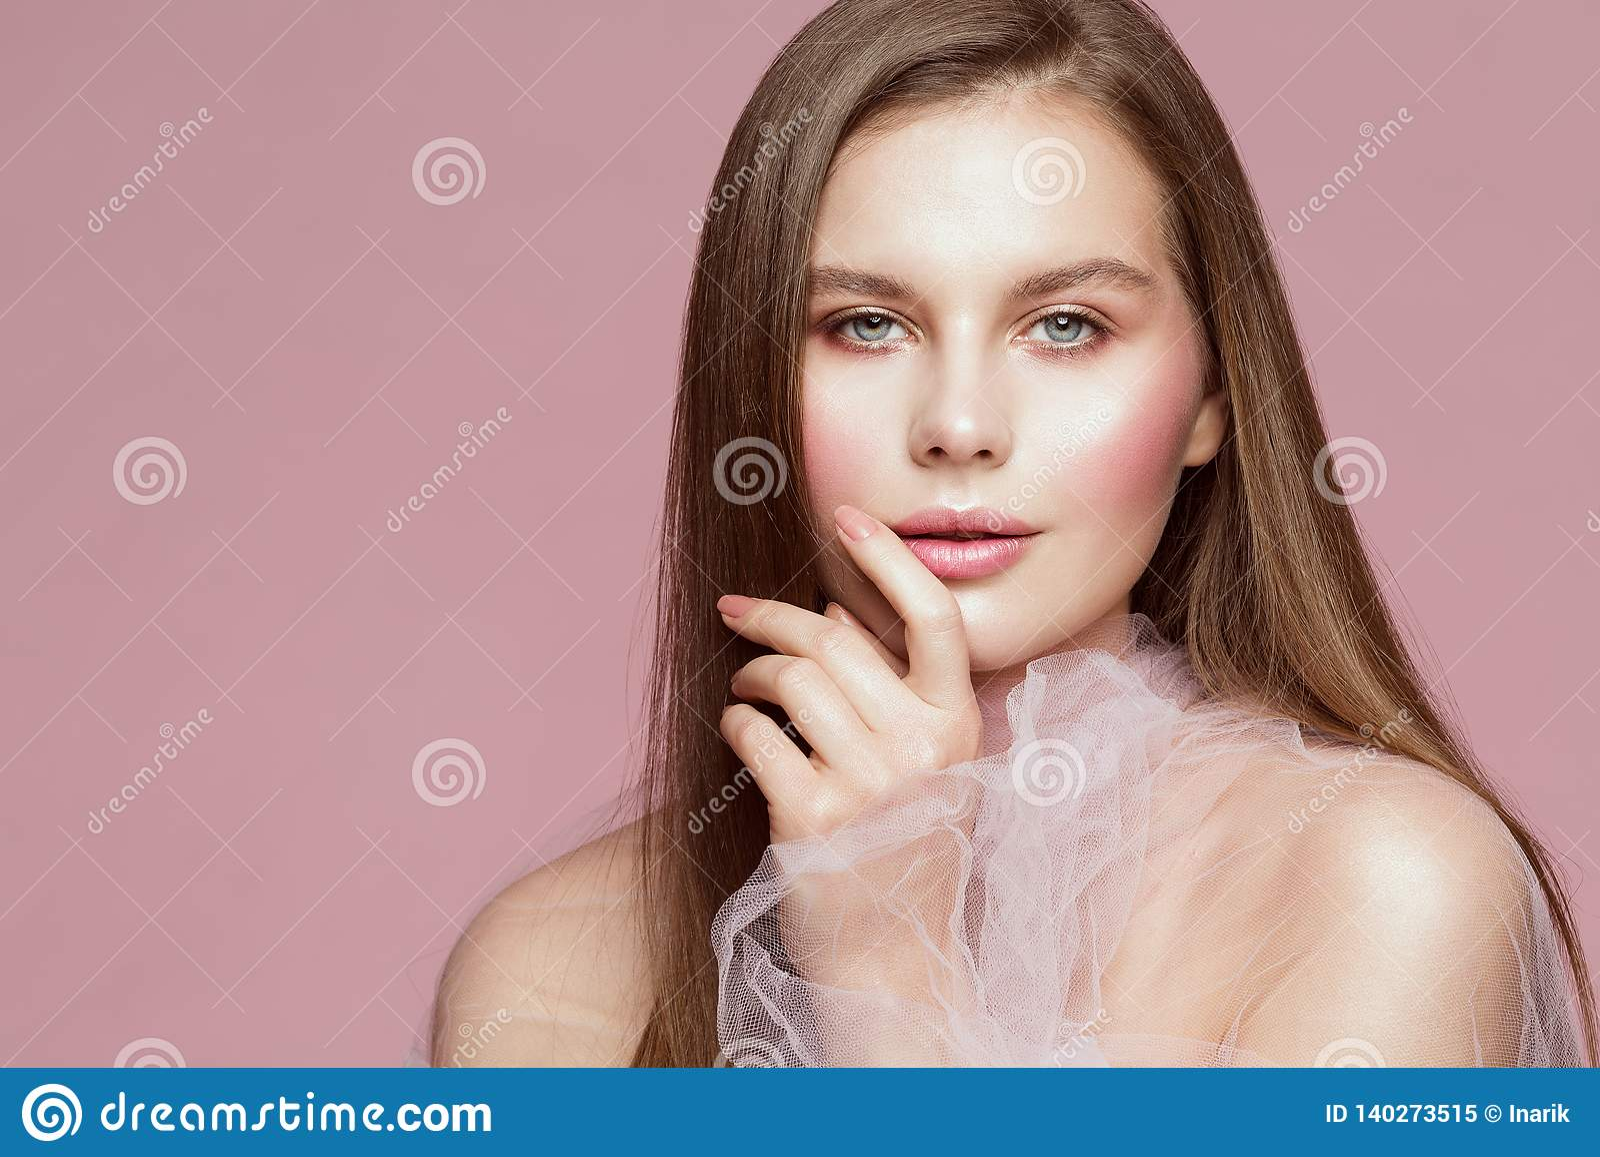 Retrato da beleza da mulher, Touching Face Lips modelo, composição bonita da menina e pregos